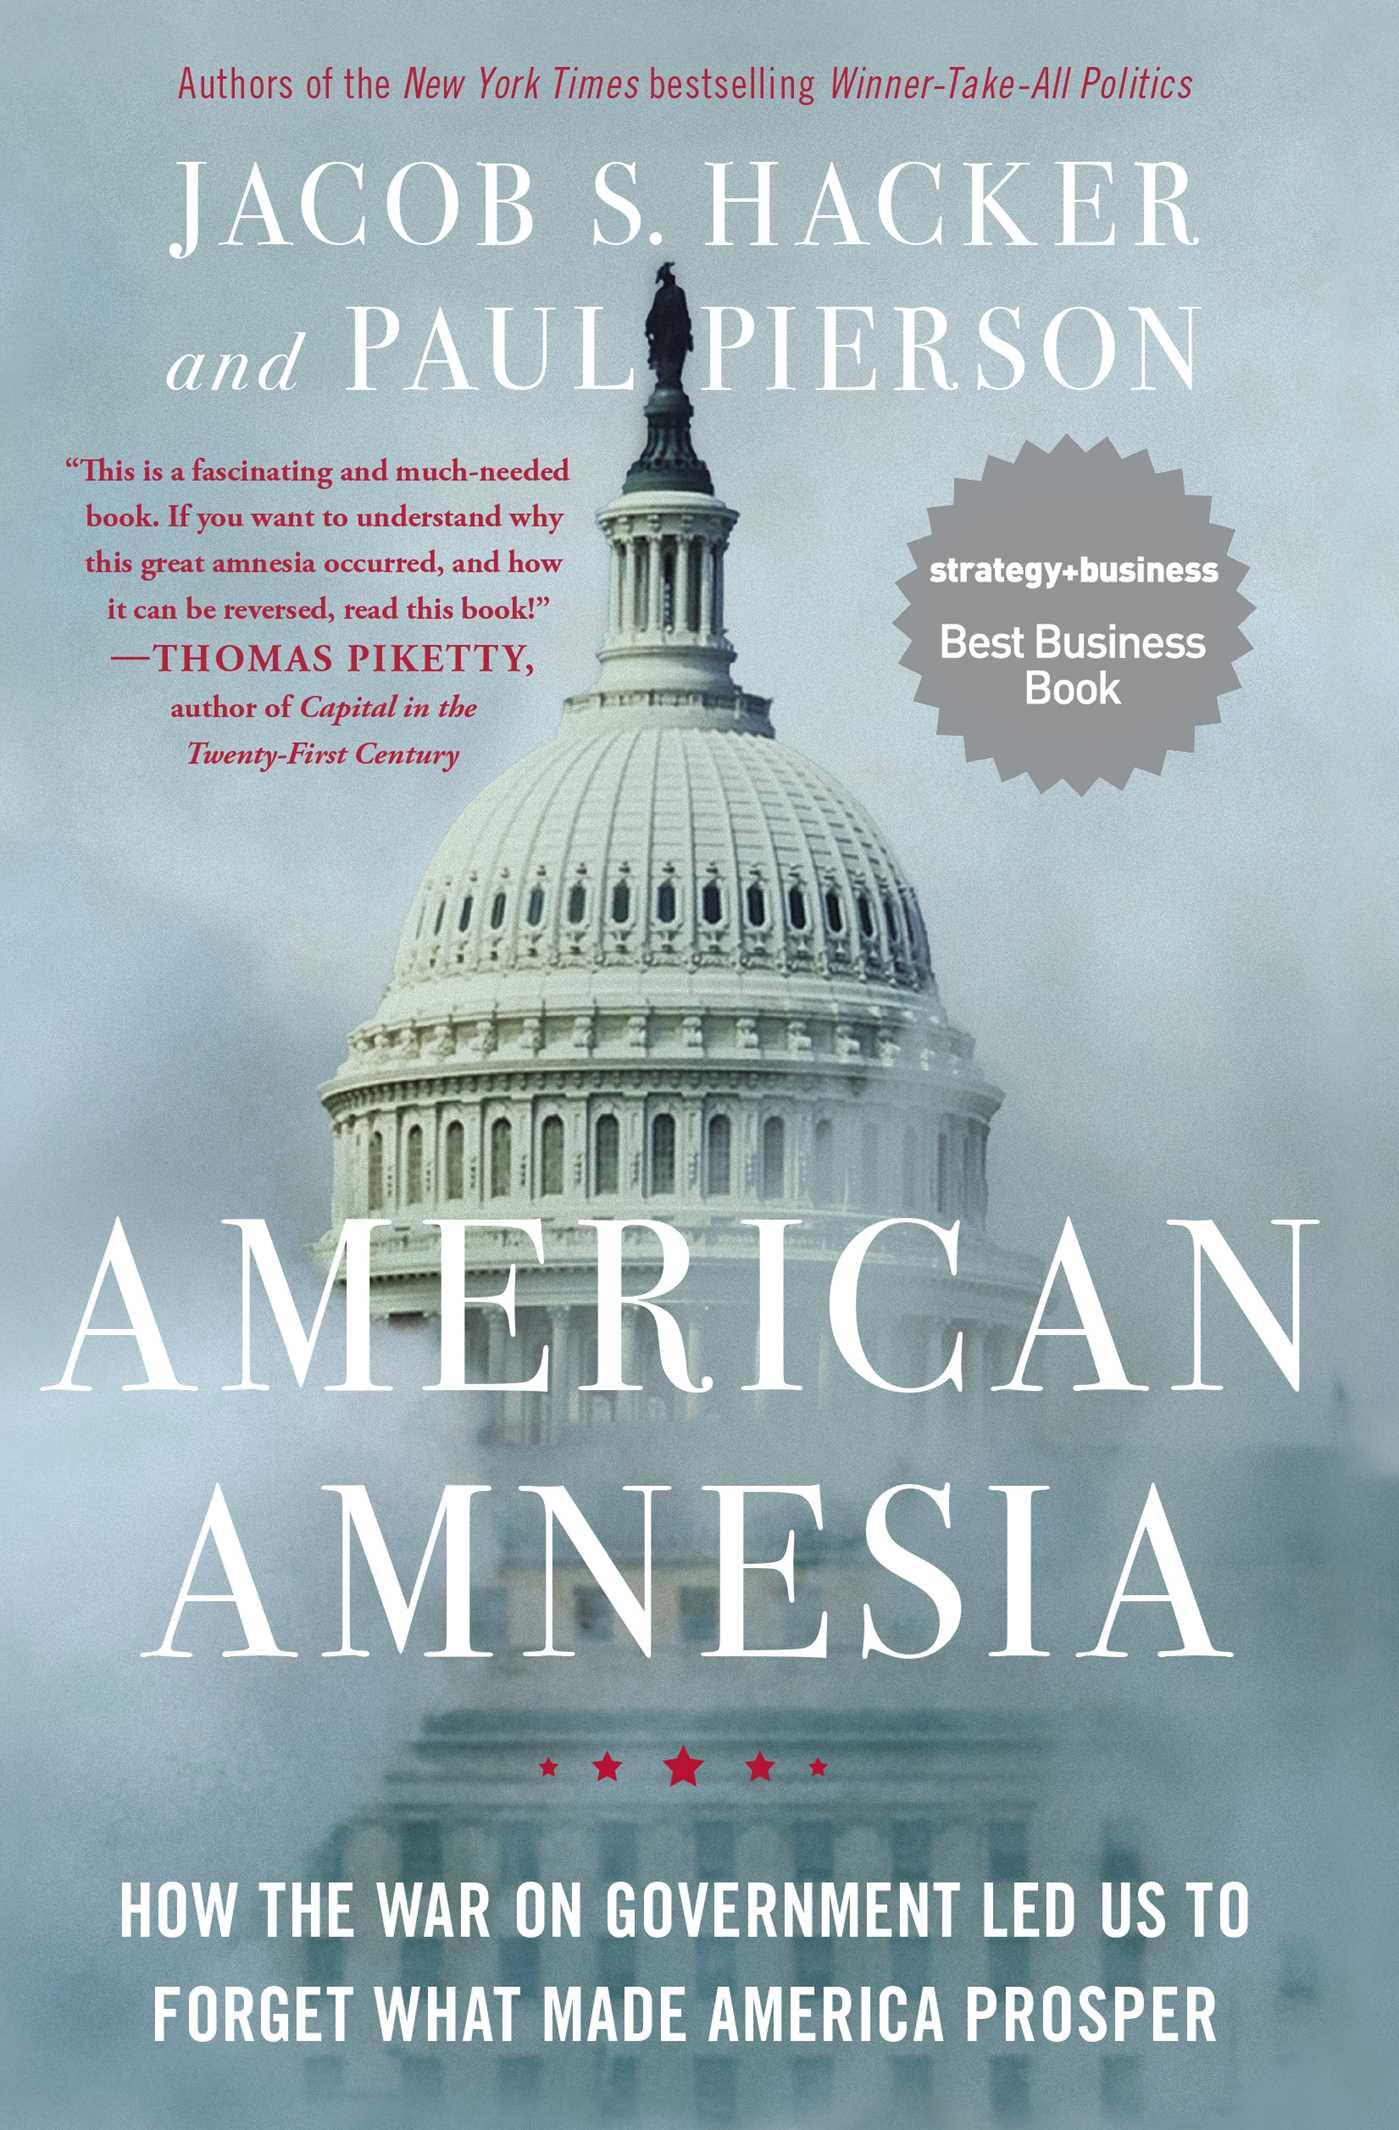 American amnesia 9781451667837 hr